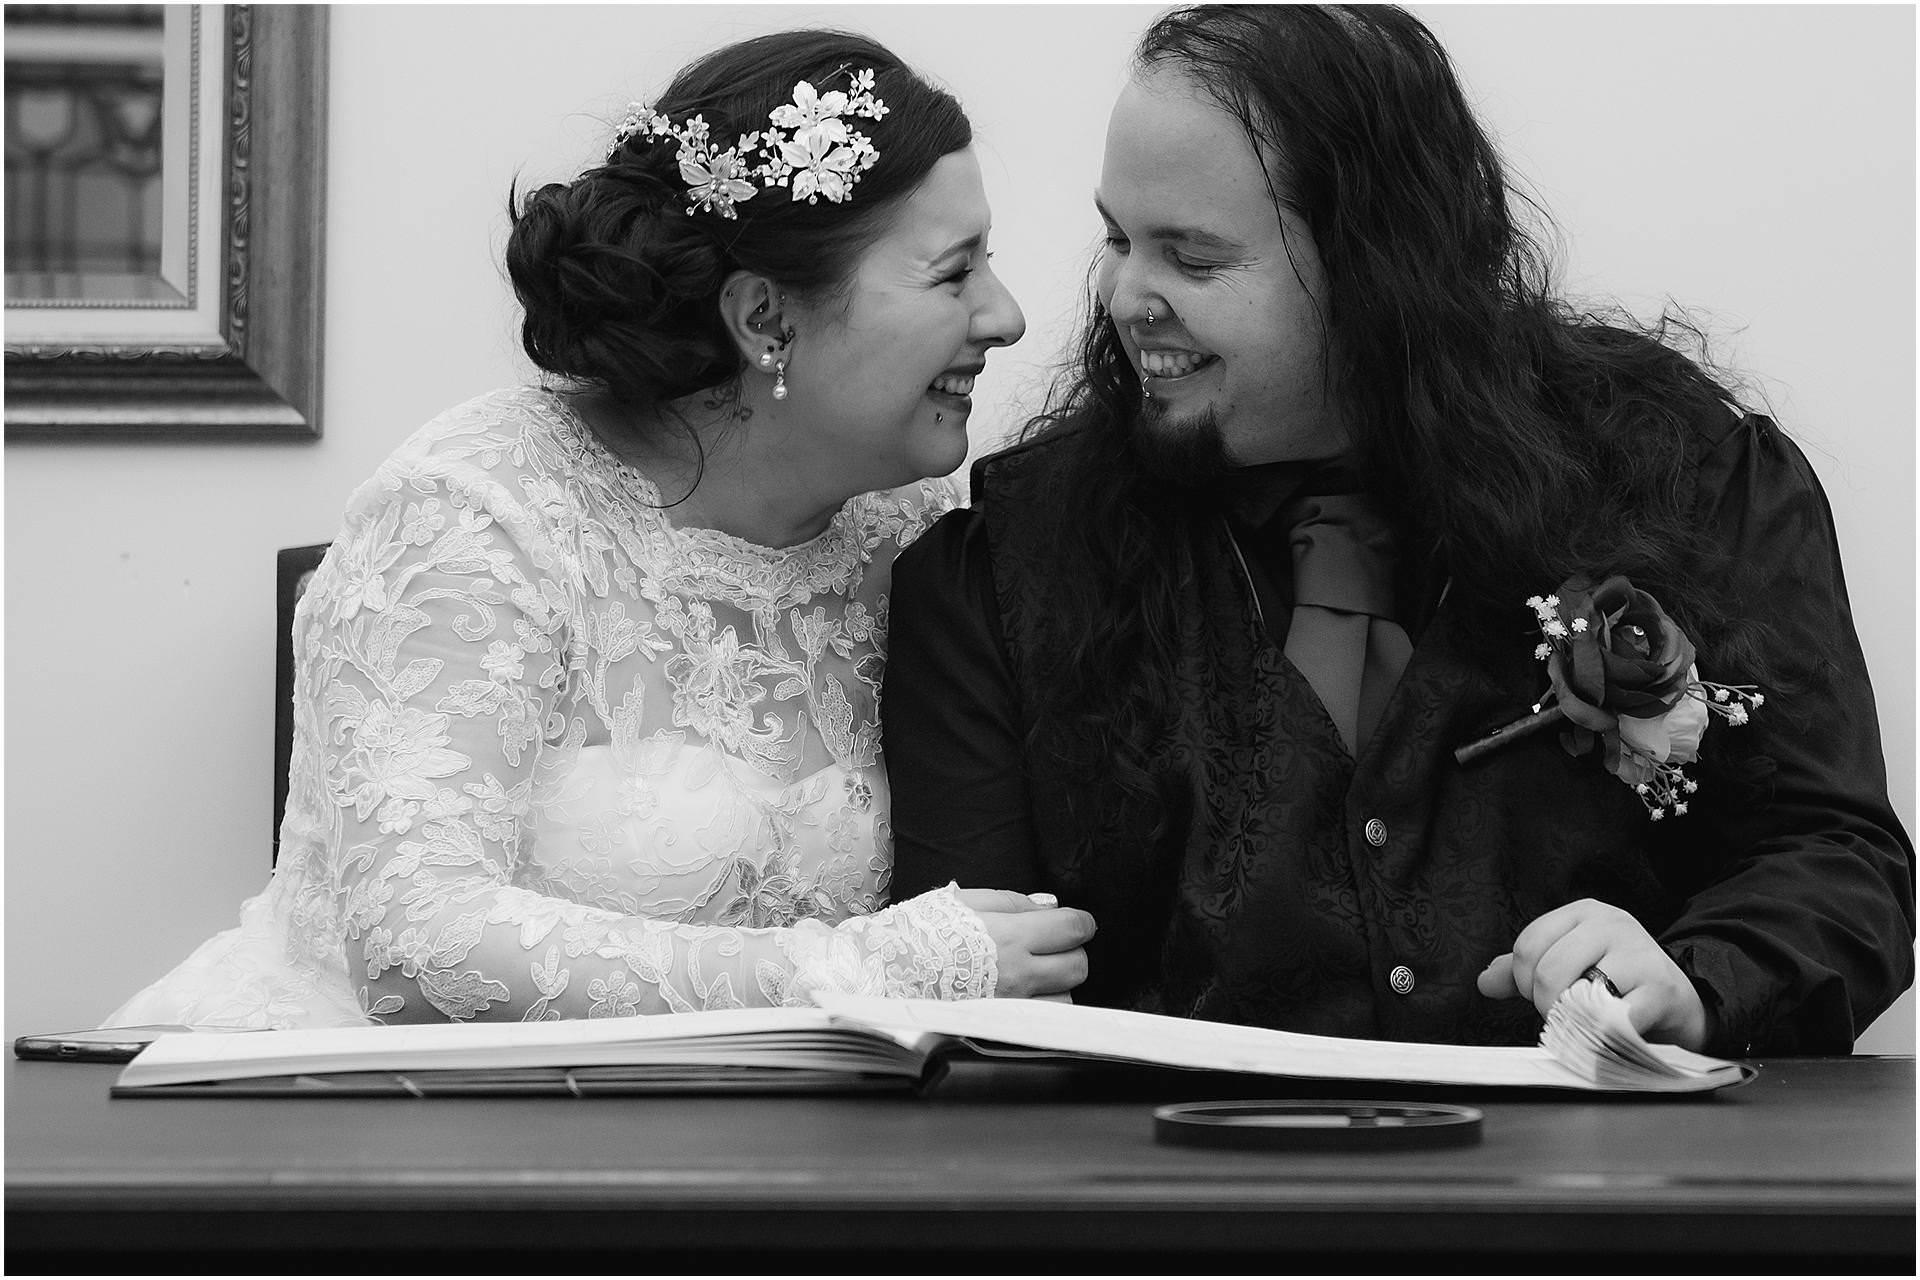 wedding_photography at dukinfield_townhall with sarah_bee_photography dukinfield_park dukinfeild_cheshire_2003.jpg